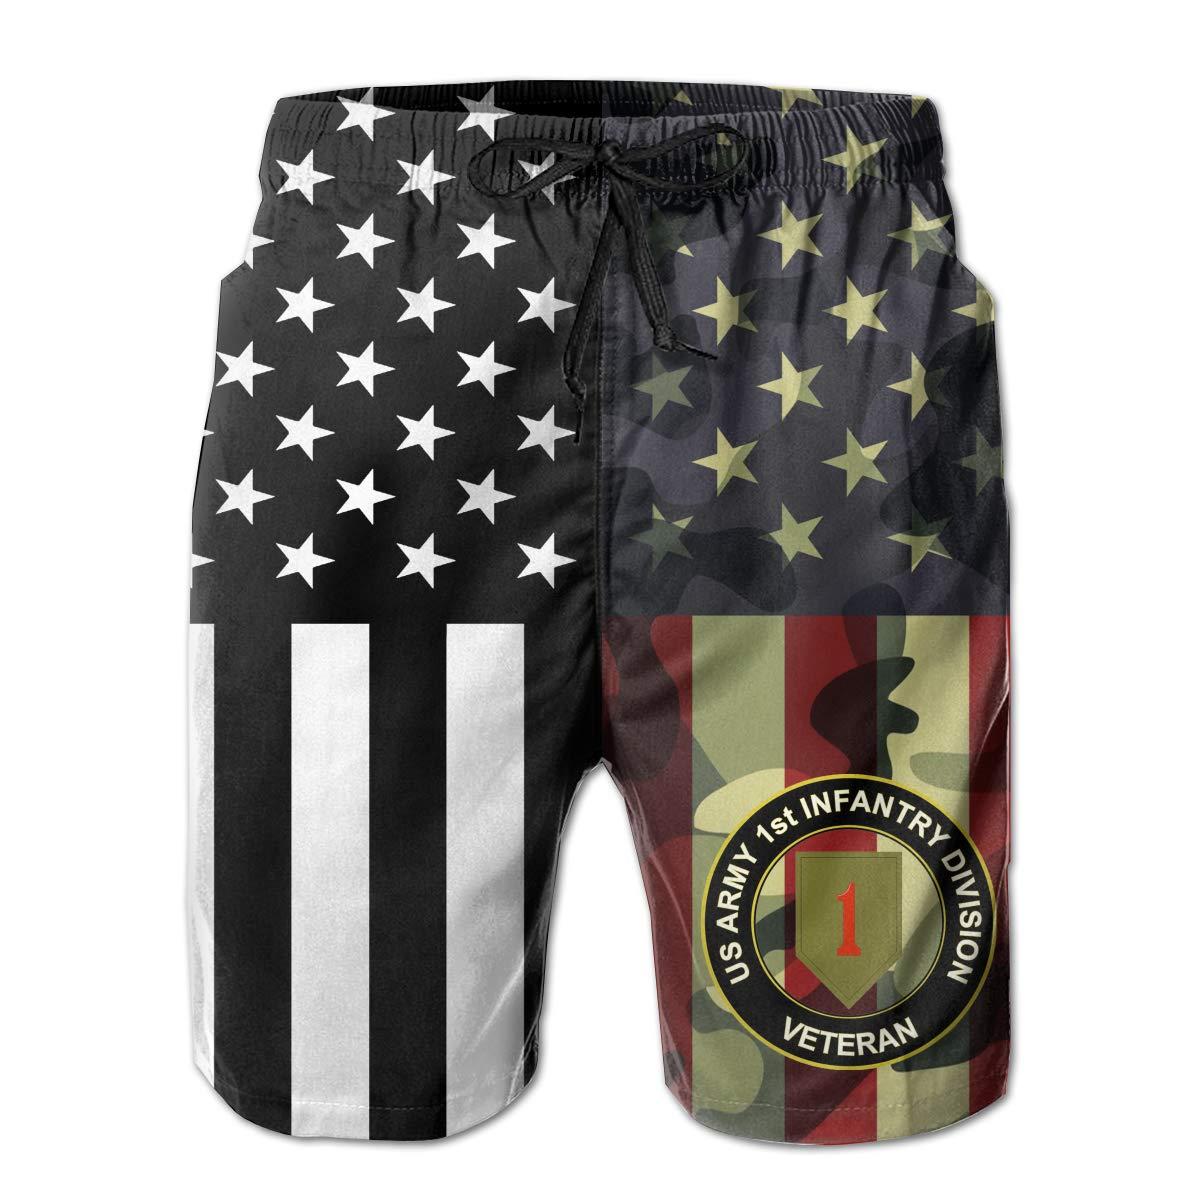 Army 1st Infantry Division Subdued Veteran Boardshorts Mens Swimtrunks Fashion Beach Shorts Casual Shorts Swim Trunks